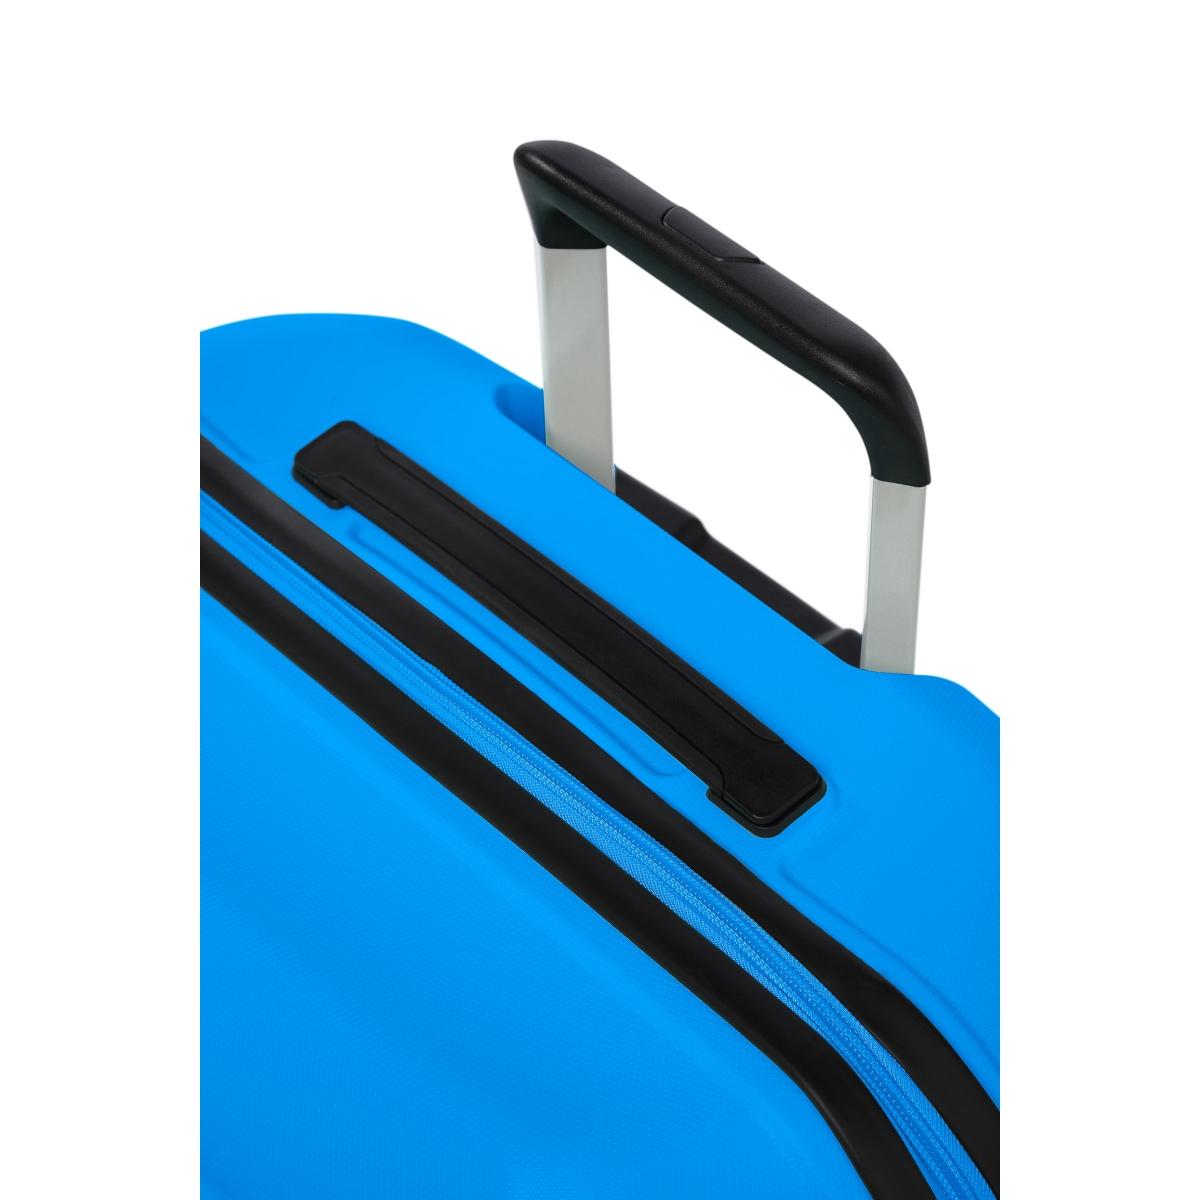 G&D Polo Suitcase PP Enjeksiyon 3'lü Valiz Seyahat Seti - Model 400.05 Çivit Mavi